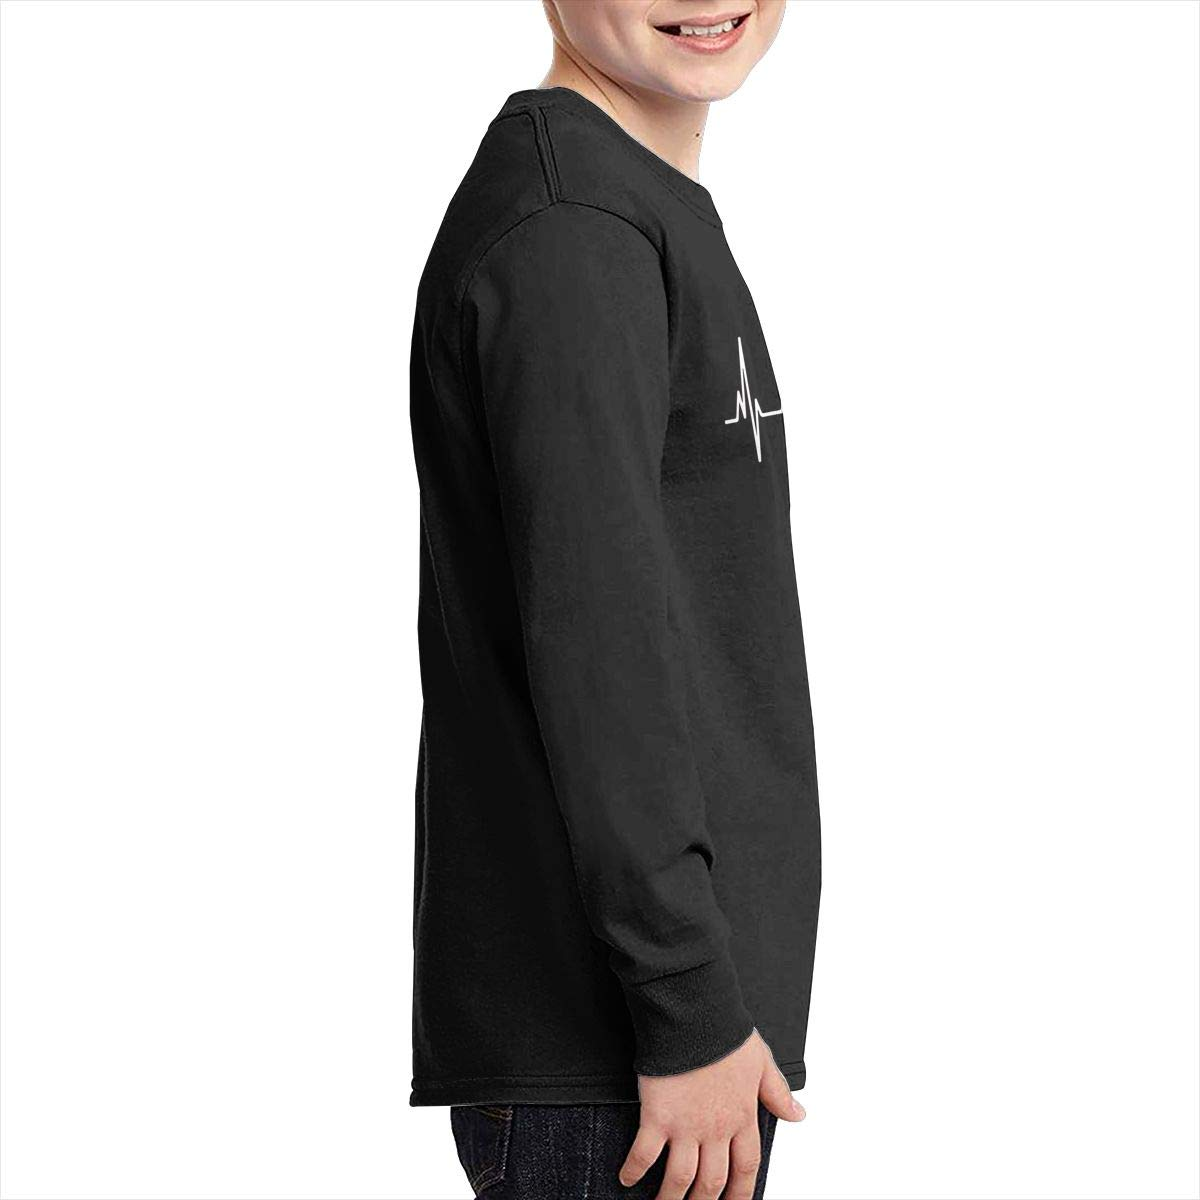 Teenagers Teen Girl Mountain Bike Heartbeat Printed Long Sleeve 100/% Cotton Clothes